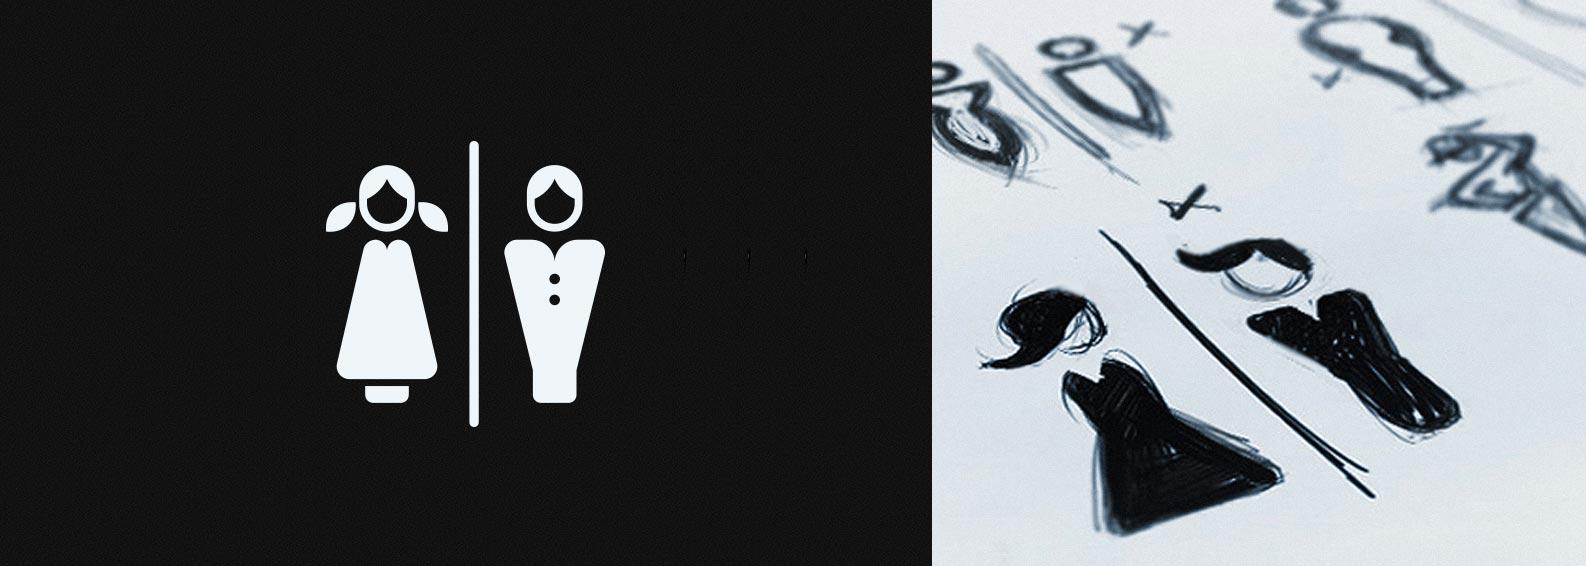 restroom icons in vector format with design studies in sketchbook